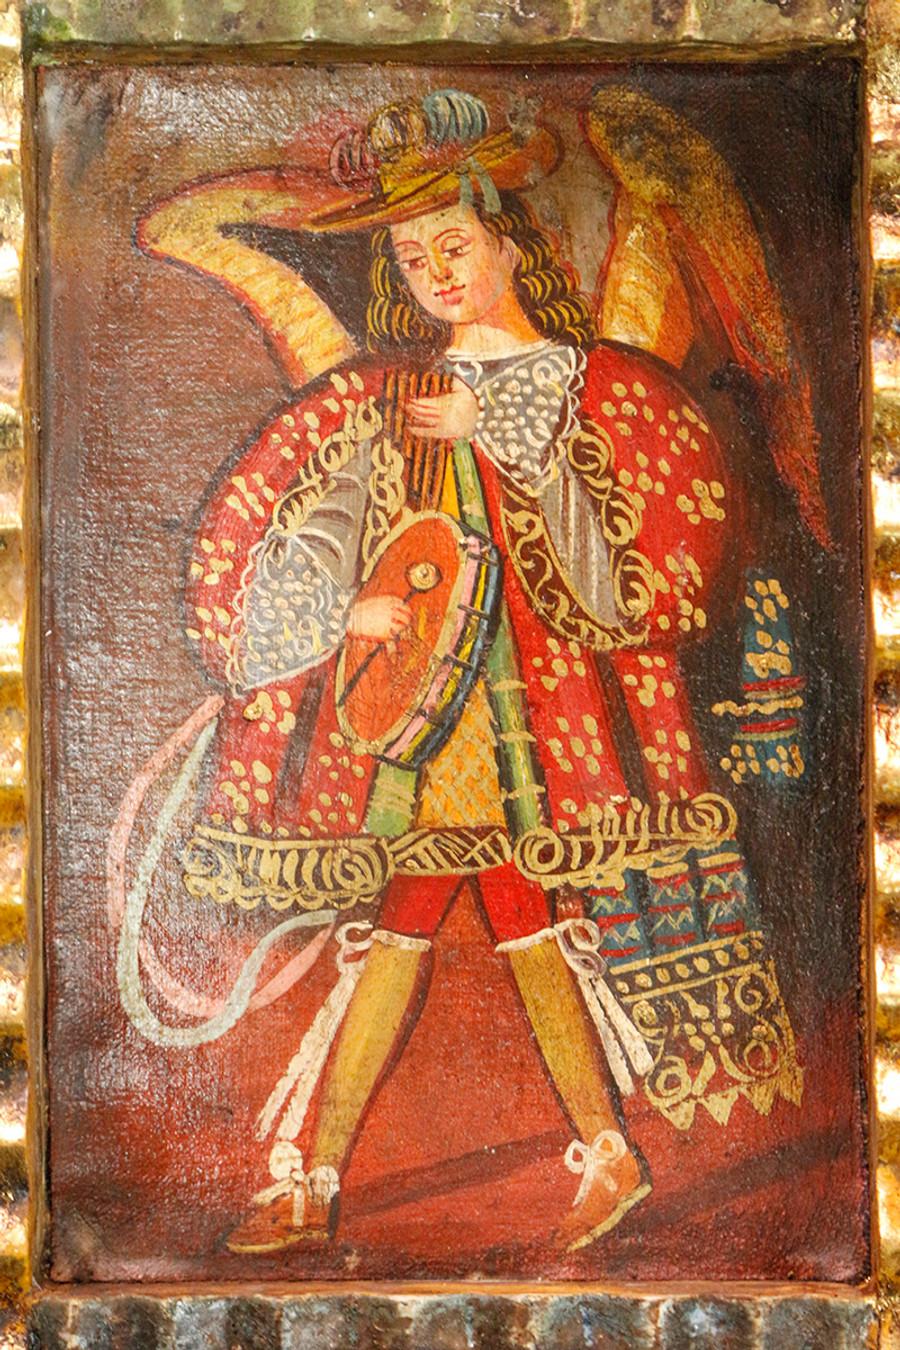 Musician Archangel Colonial Peru Art Handmade Retablo Handcarved Altarpiece